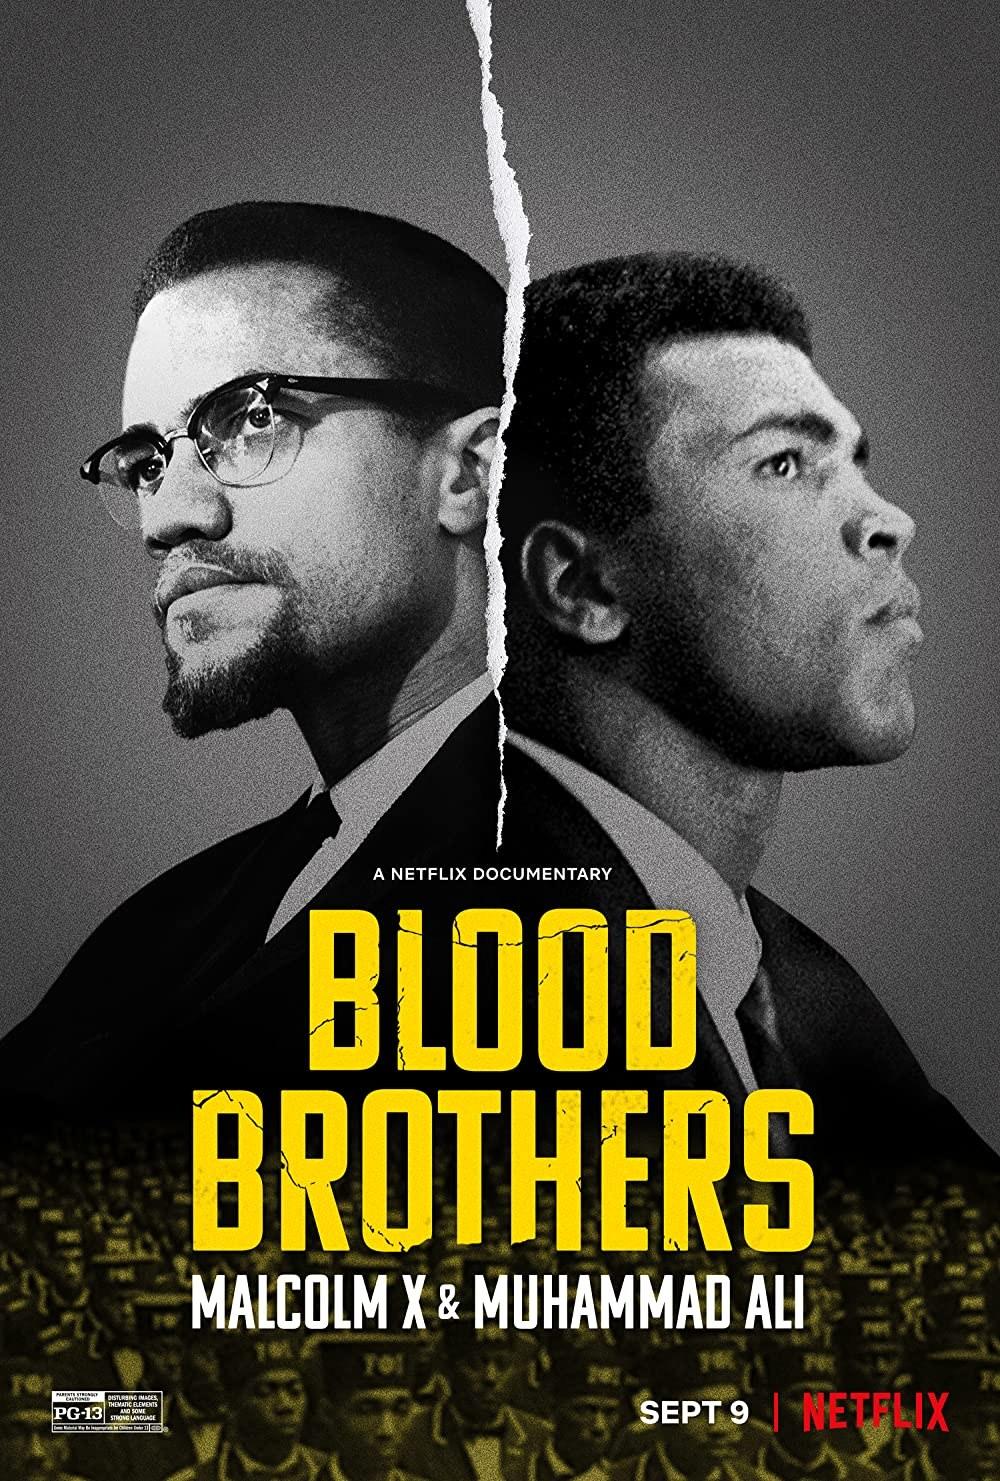 Blood Brothers - Malcolm X & Muhammad Ali.jpg